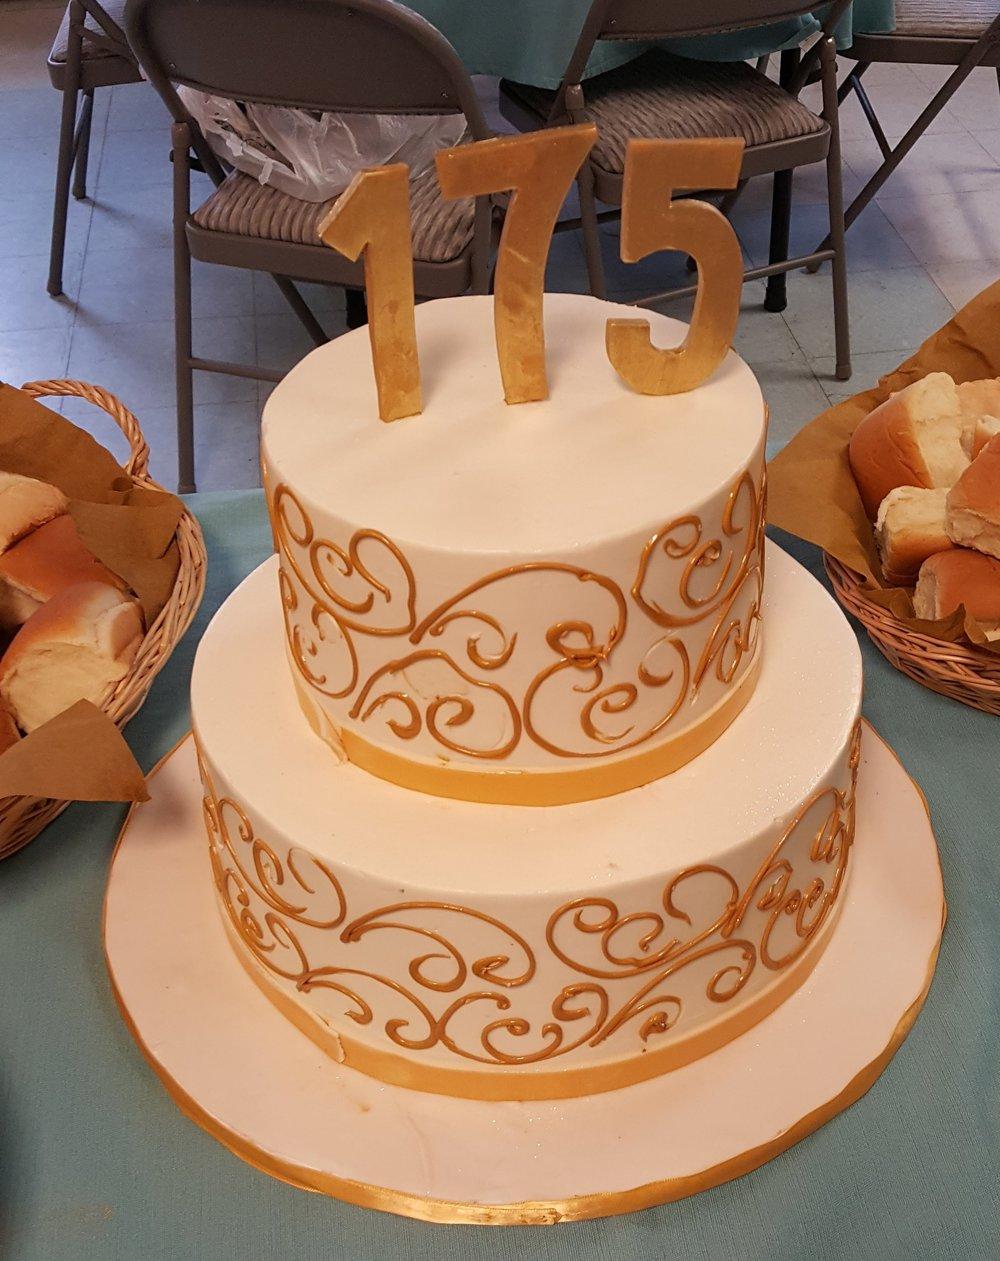 175th cake.jpg